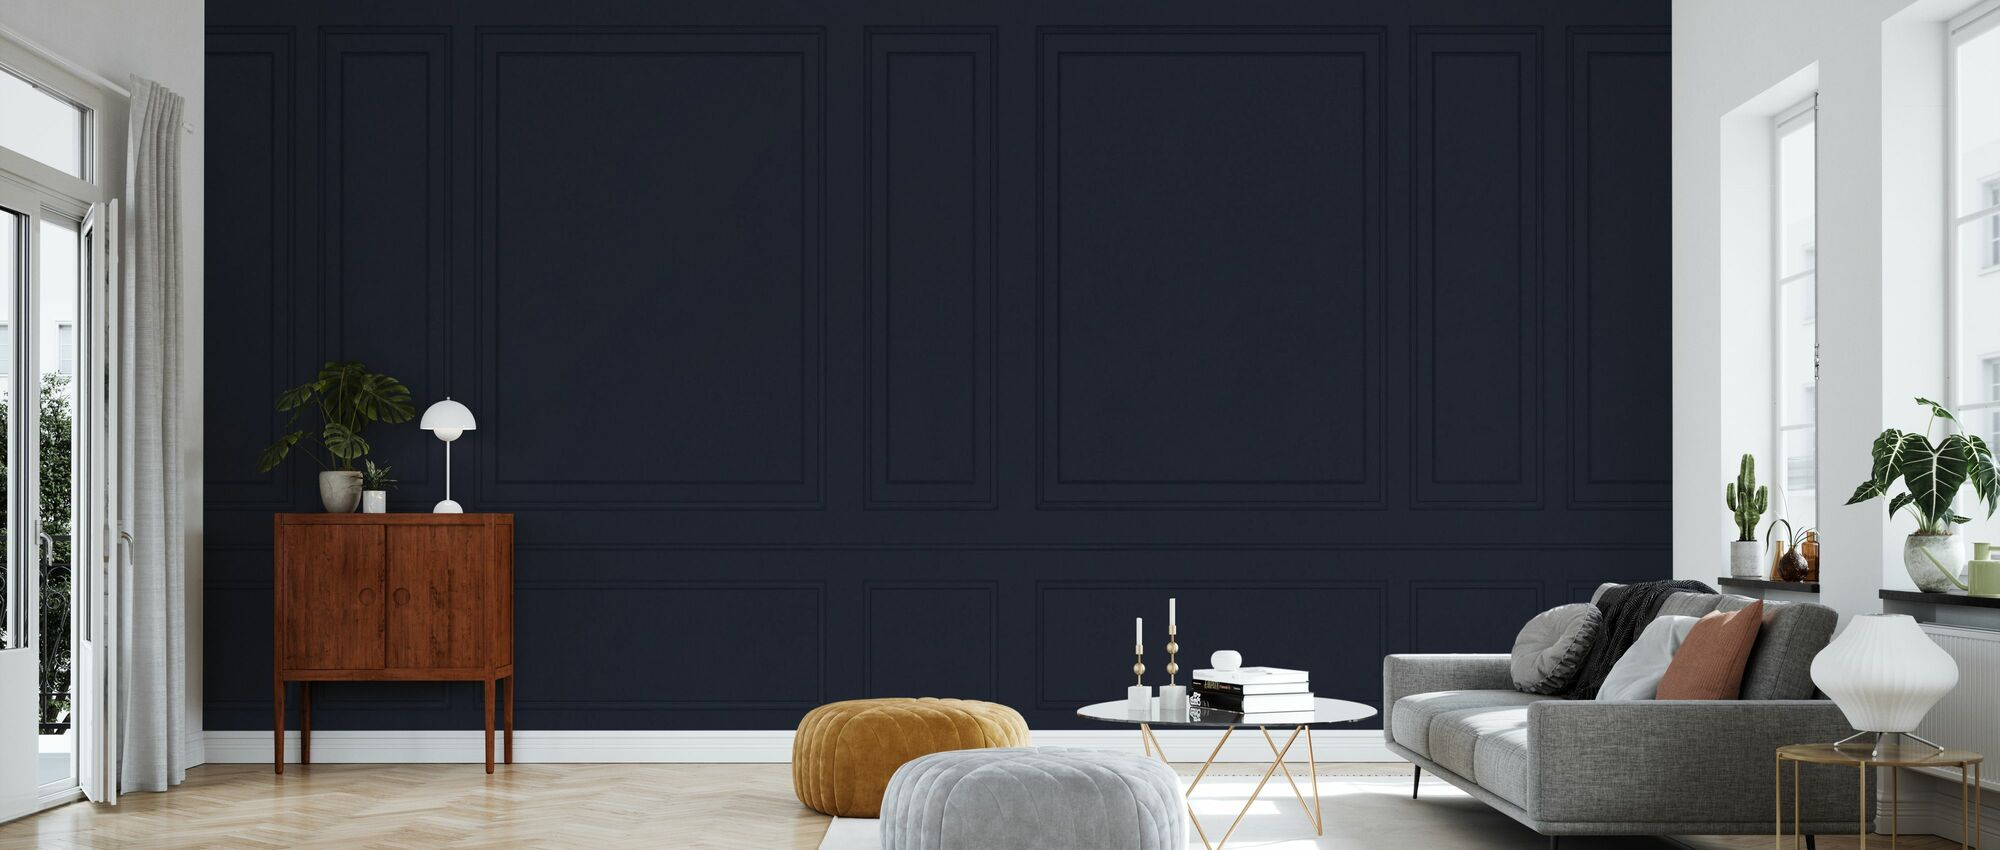 Voguish Wall Panel - Blue - Wallpaper - Living Room